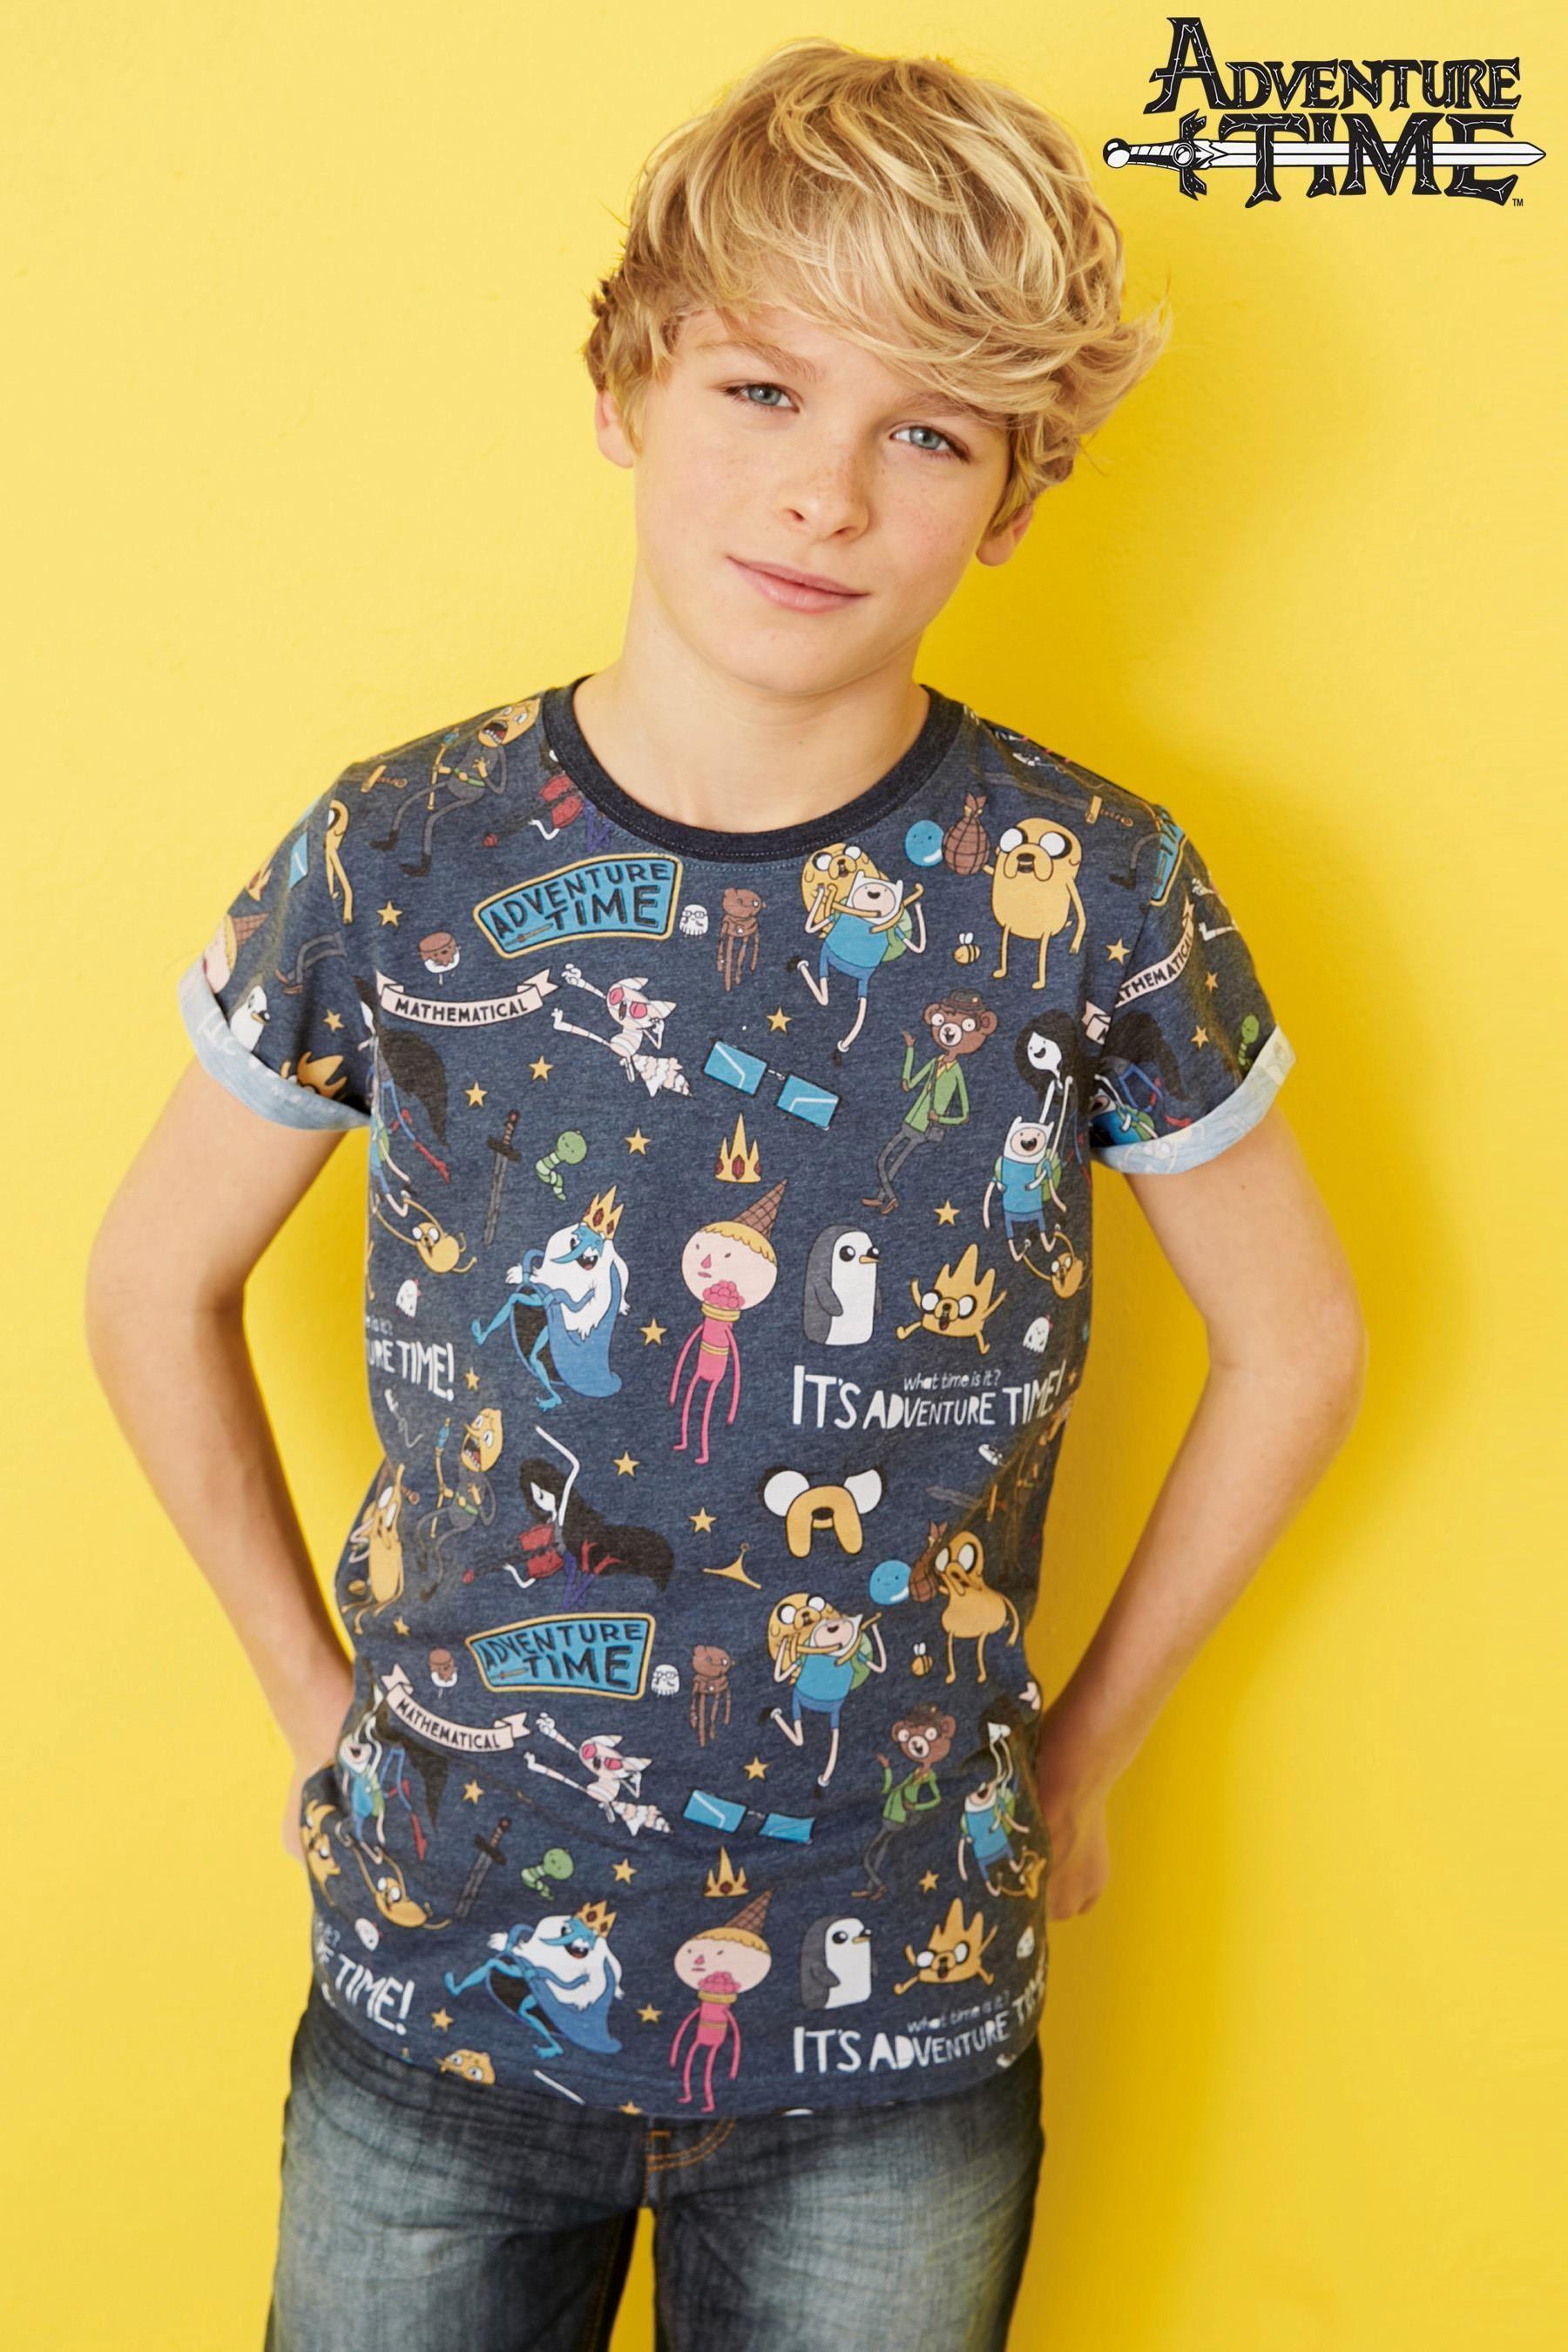 Shirt design online uk - Buy Navy Adventure Time T Shirt From The Next Uk Online Shop